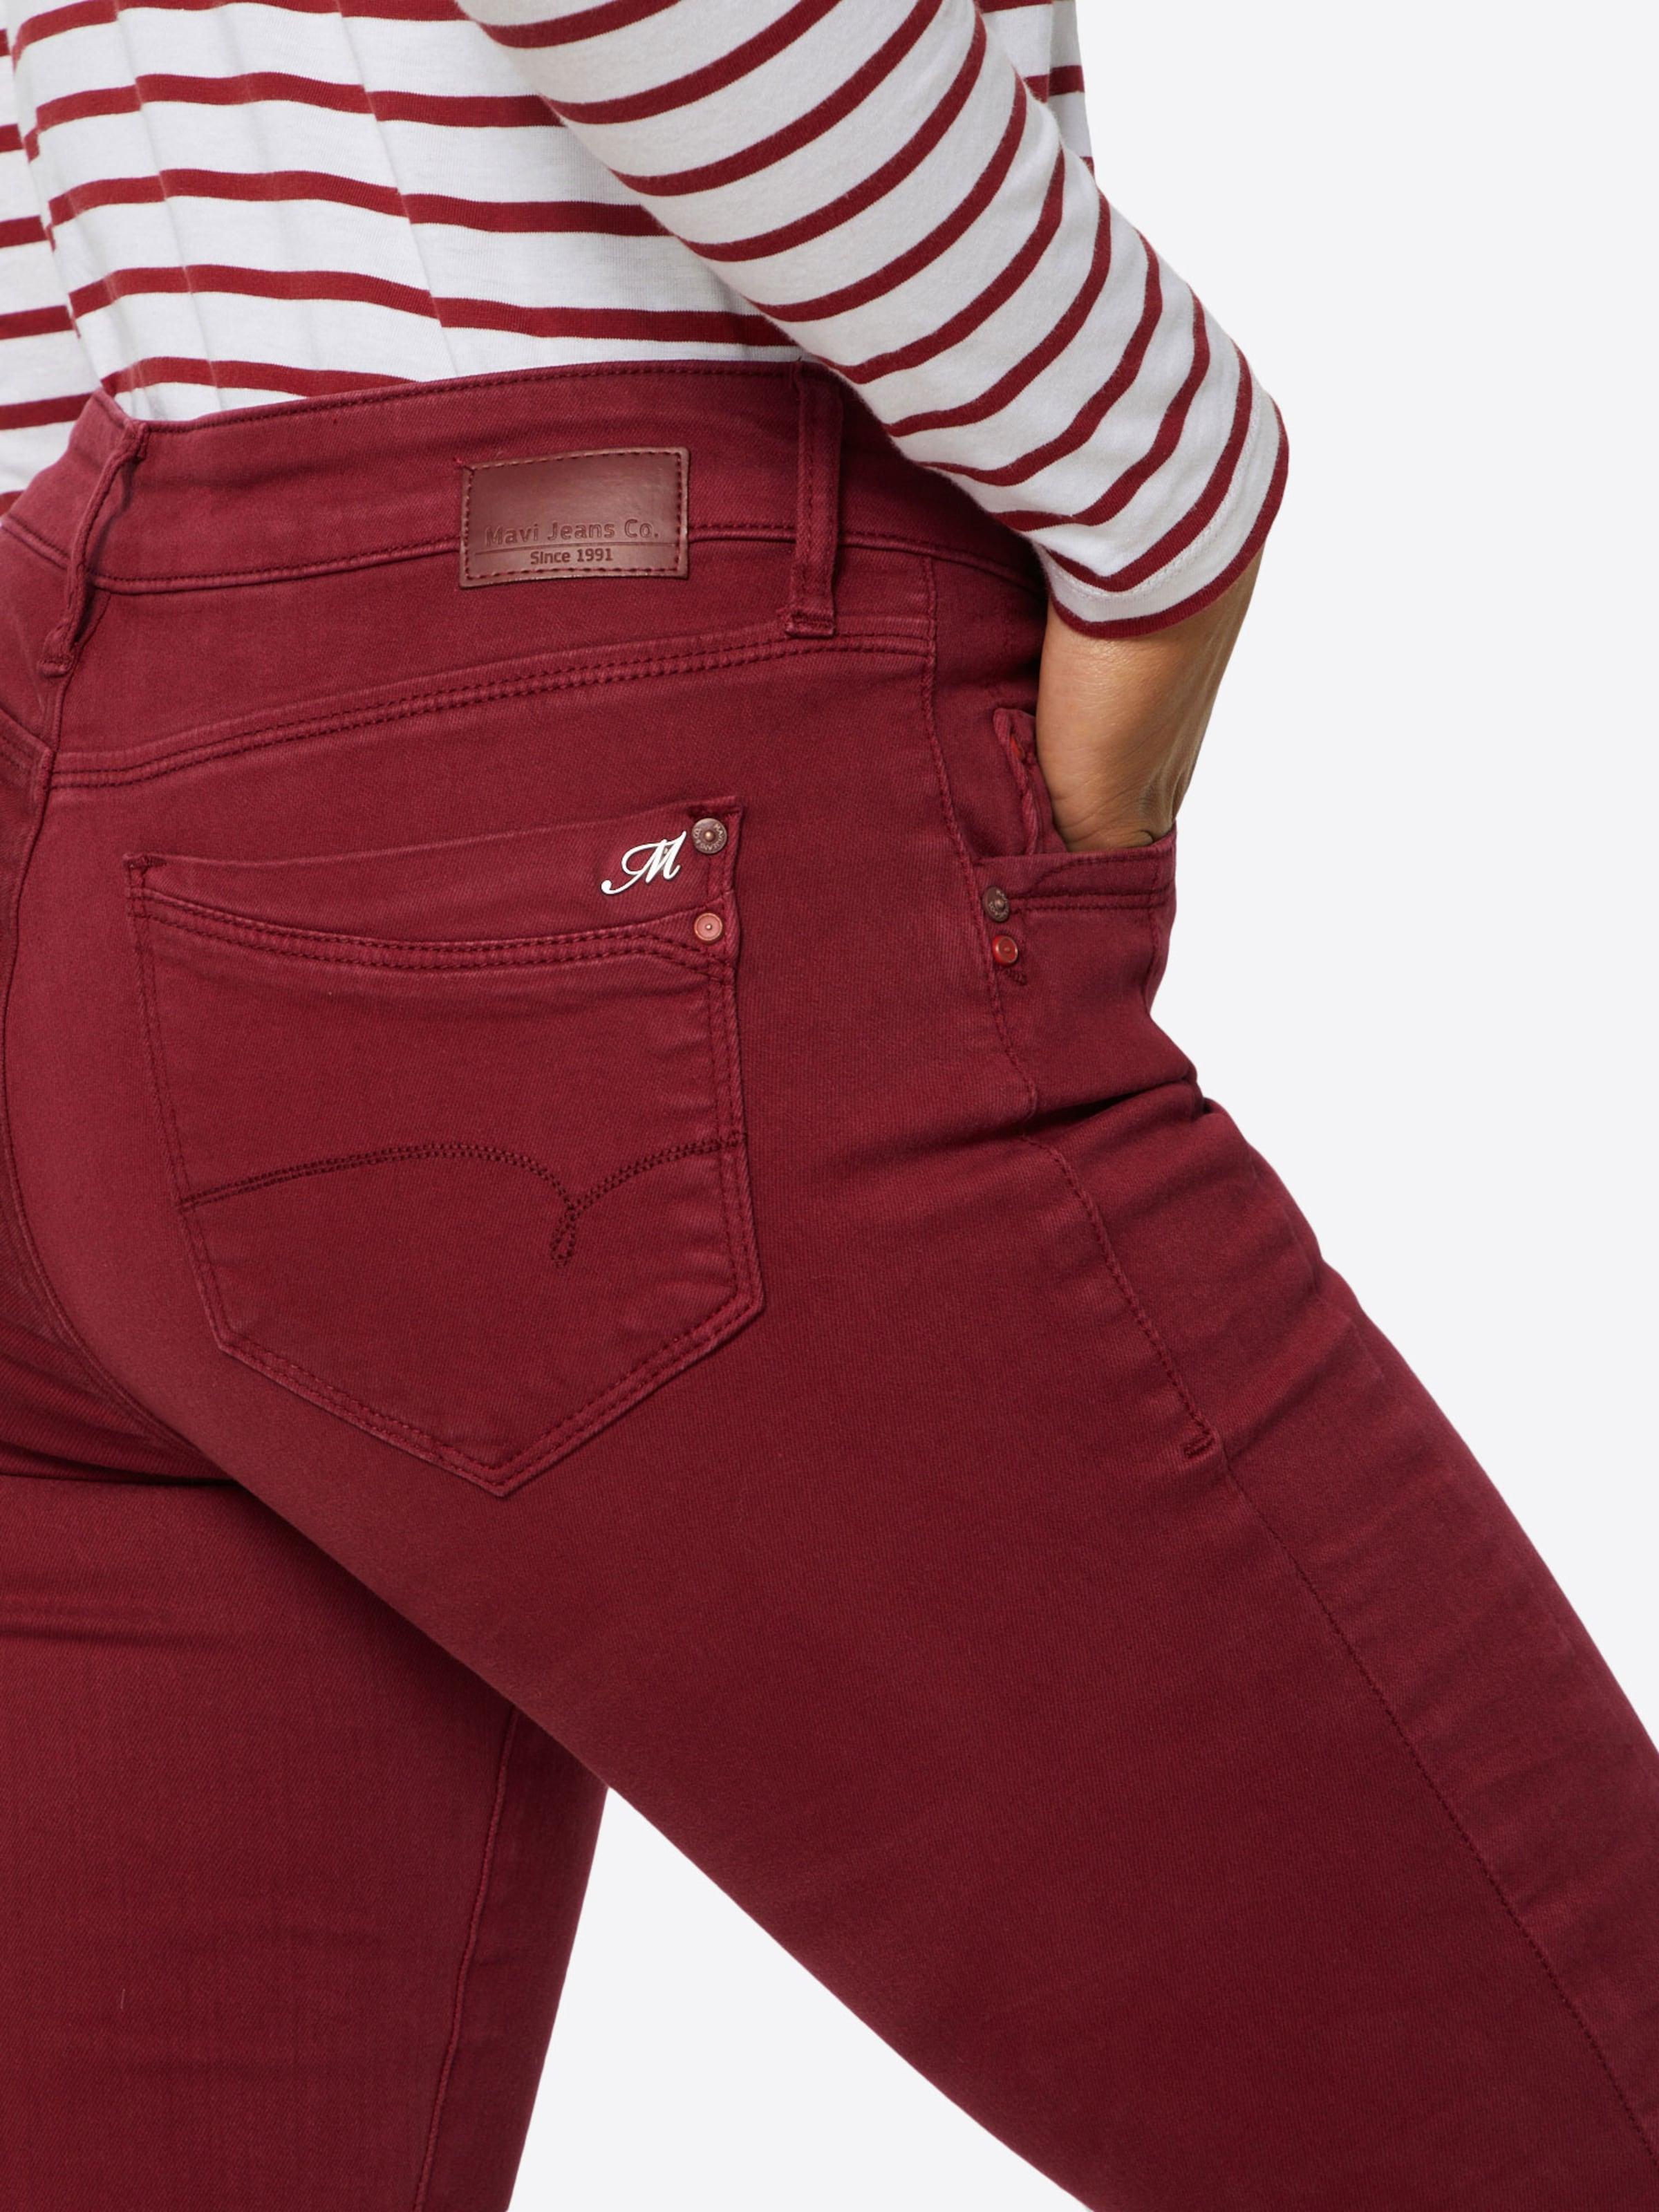 Jeans 'adriana' Mavi Mavi In Jeans Mavi Jeans 'adriana' Bordeaux Bordeaux In DH2IW9E